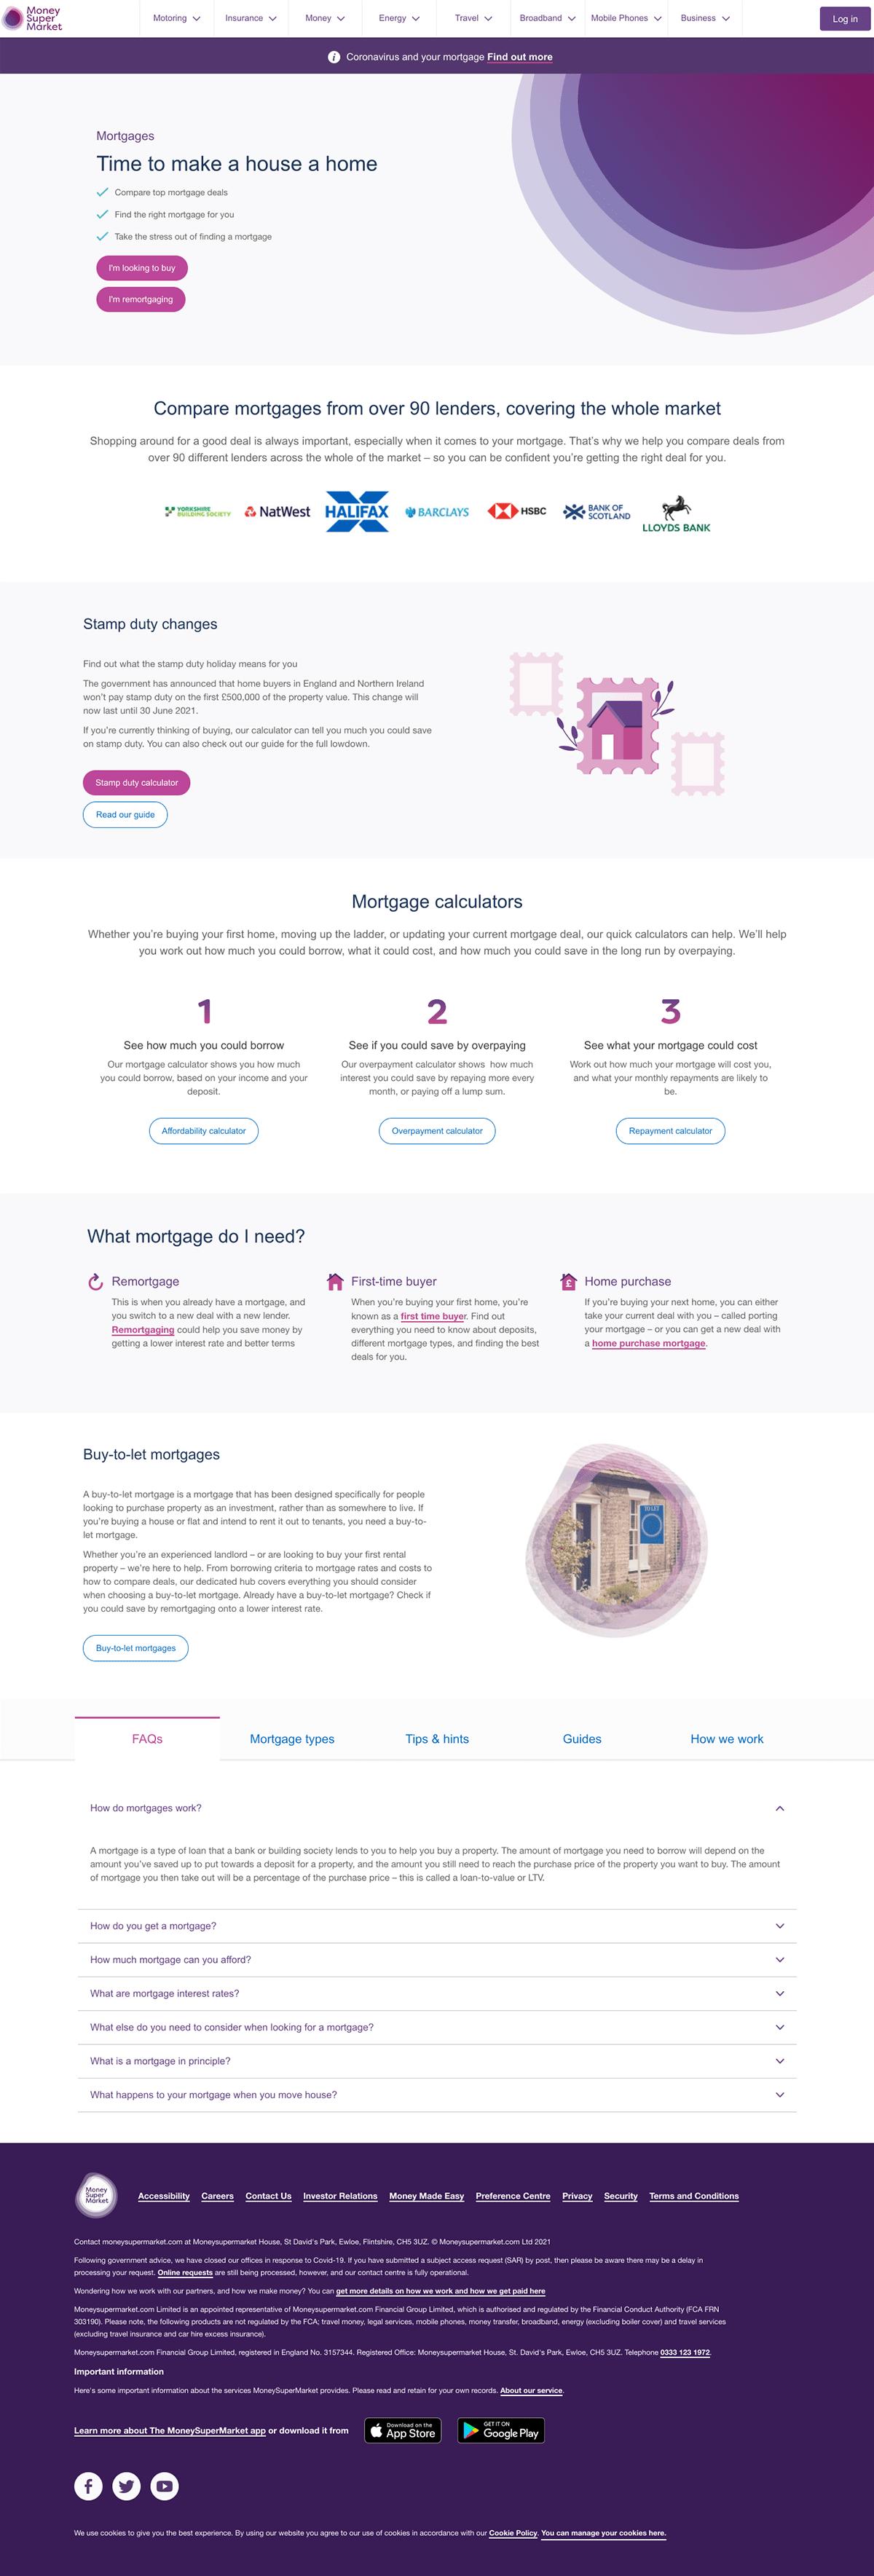 MoneySuperMarket Mortgage Comparison Page